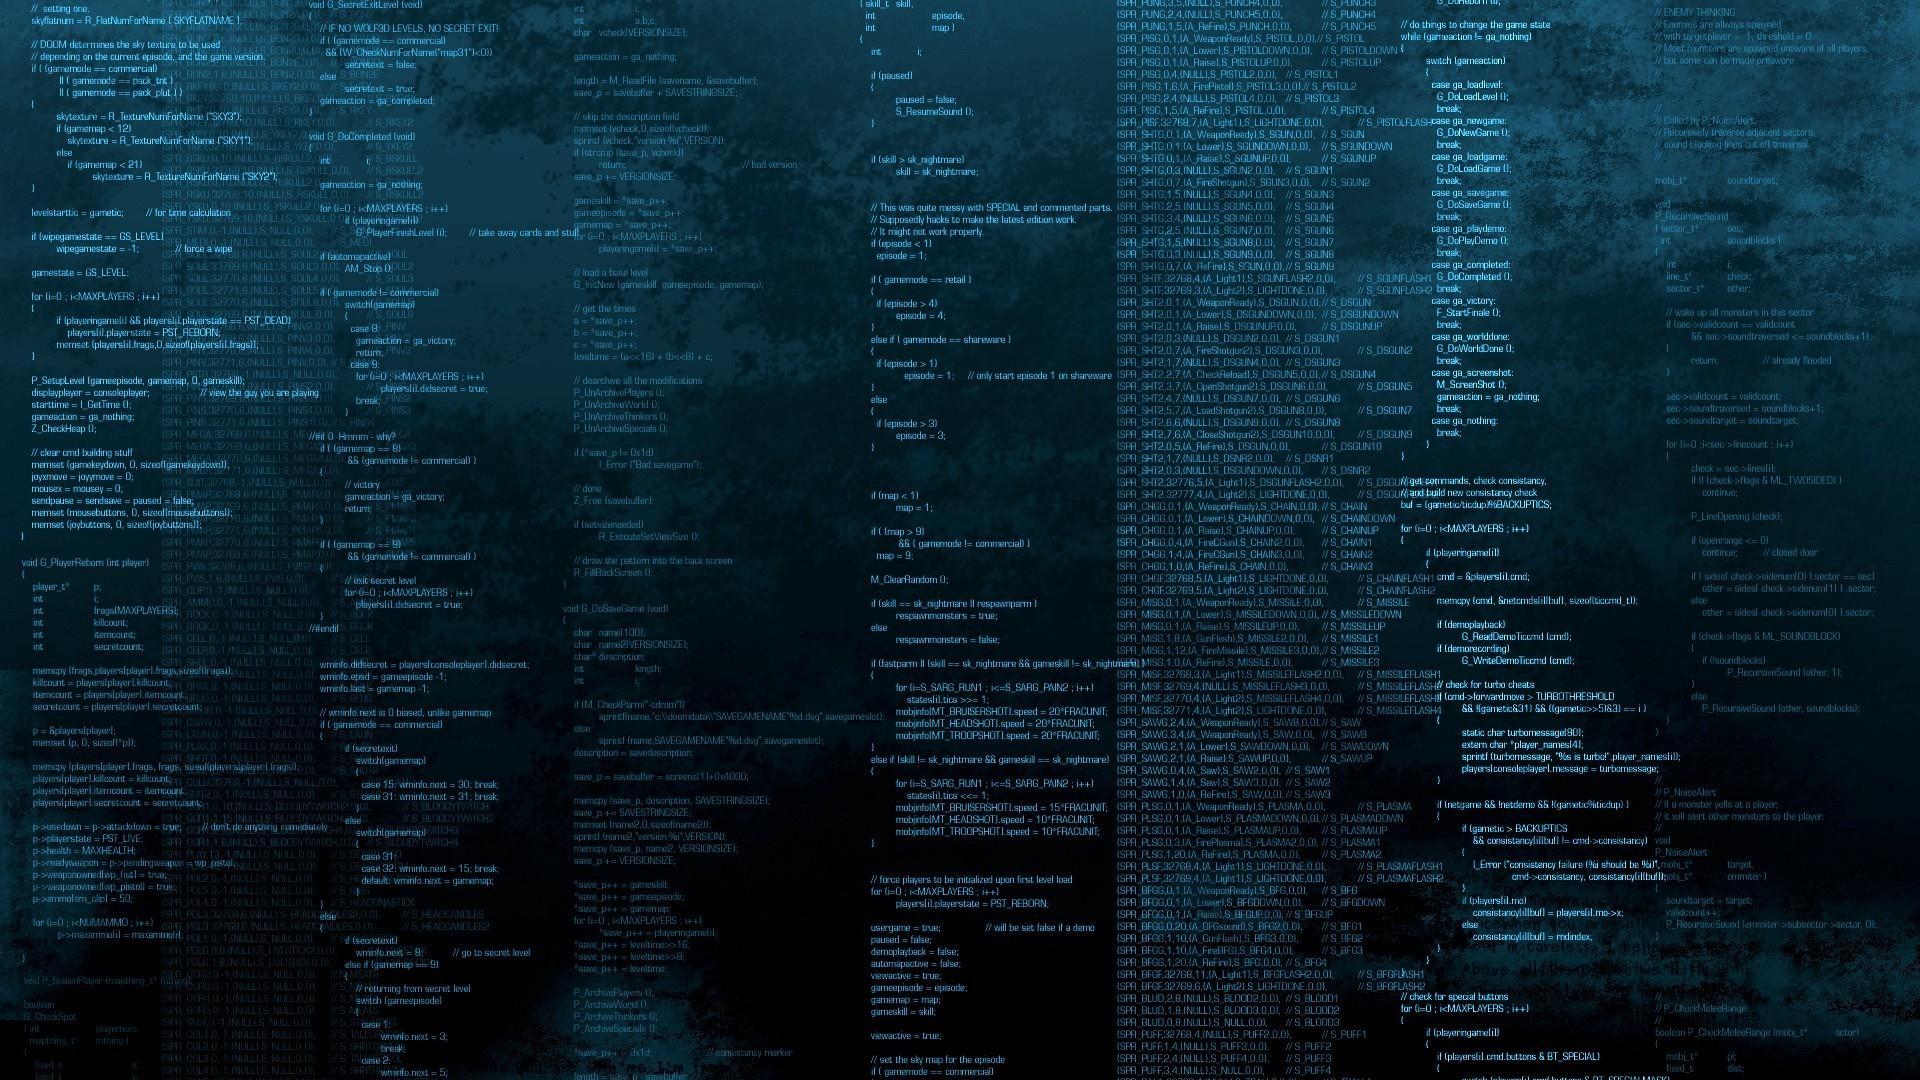 Download Tech Wallpaper Hd Backgrounds Download Itl Cat